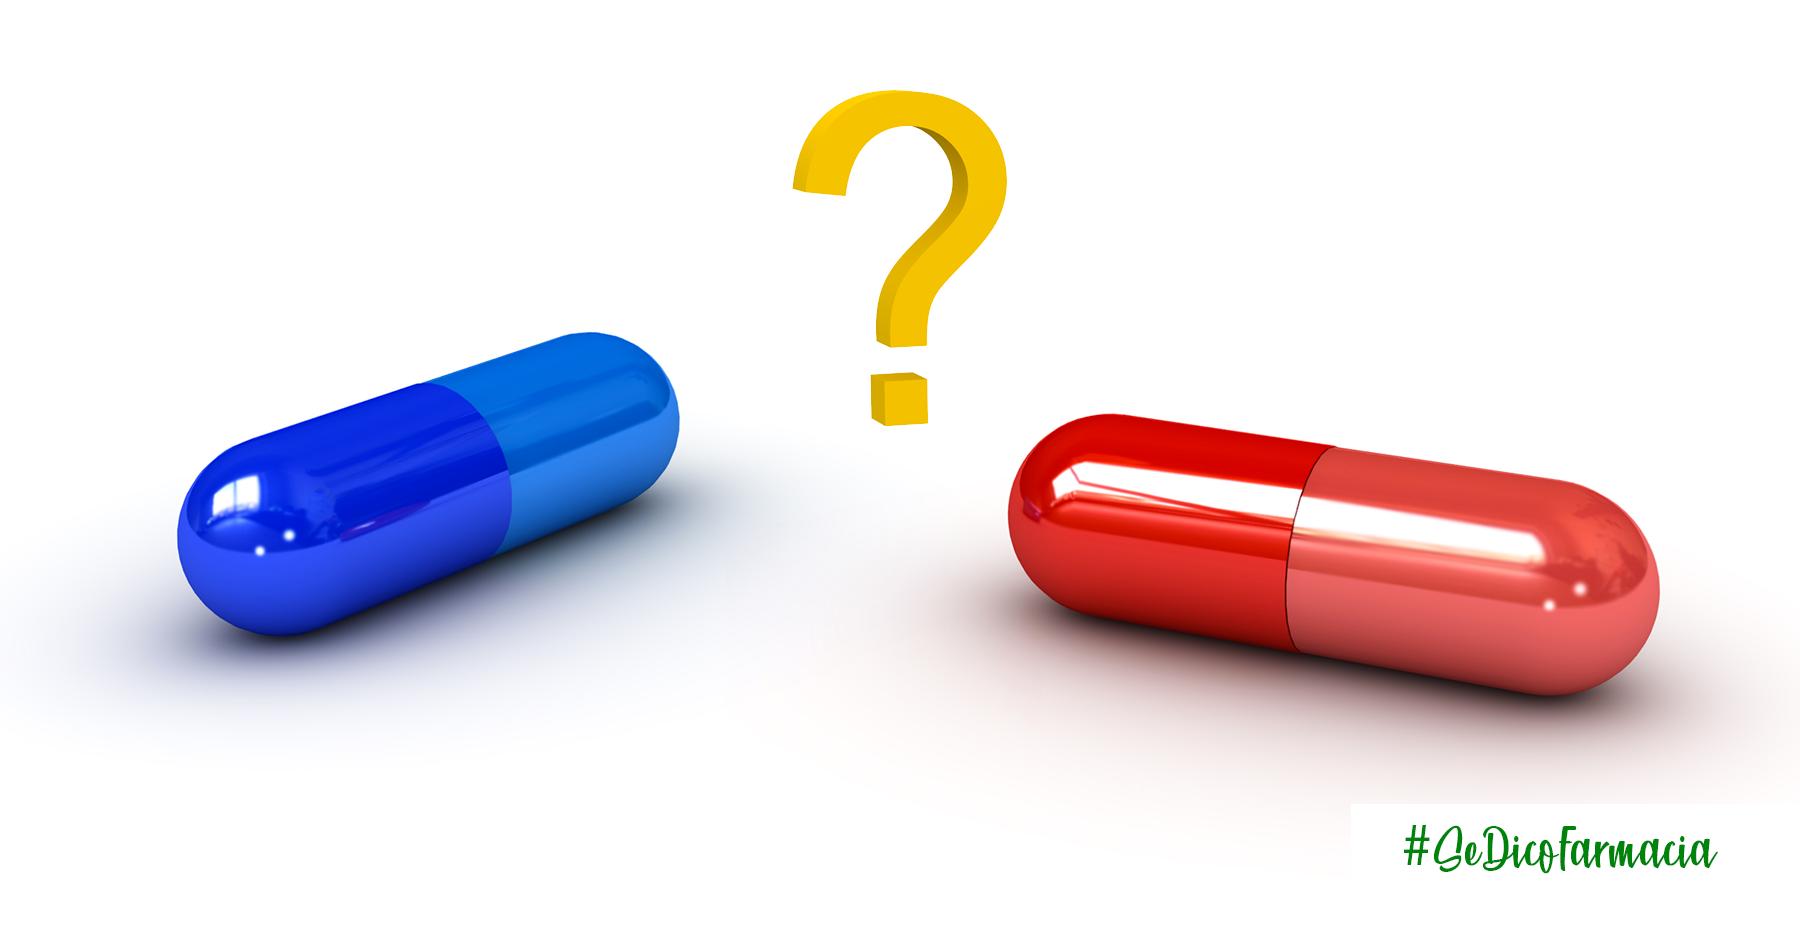 http://www.farmaciaserafini.net/wp-content/uploads/2019/10/farmaco_generico_brand.png